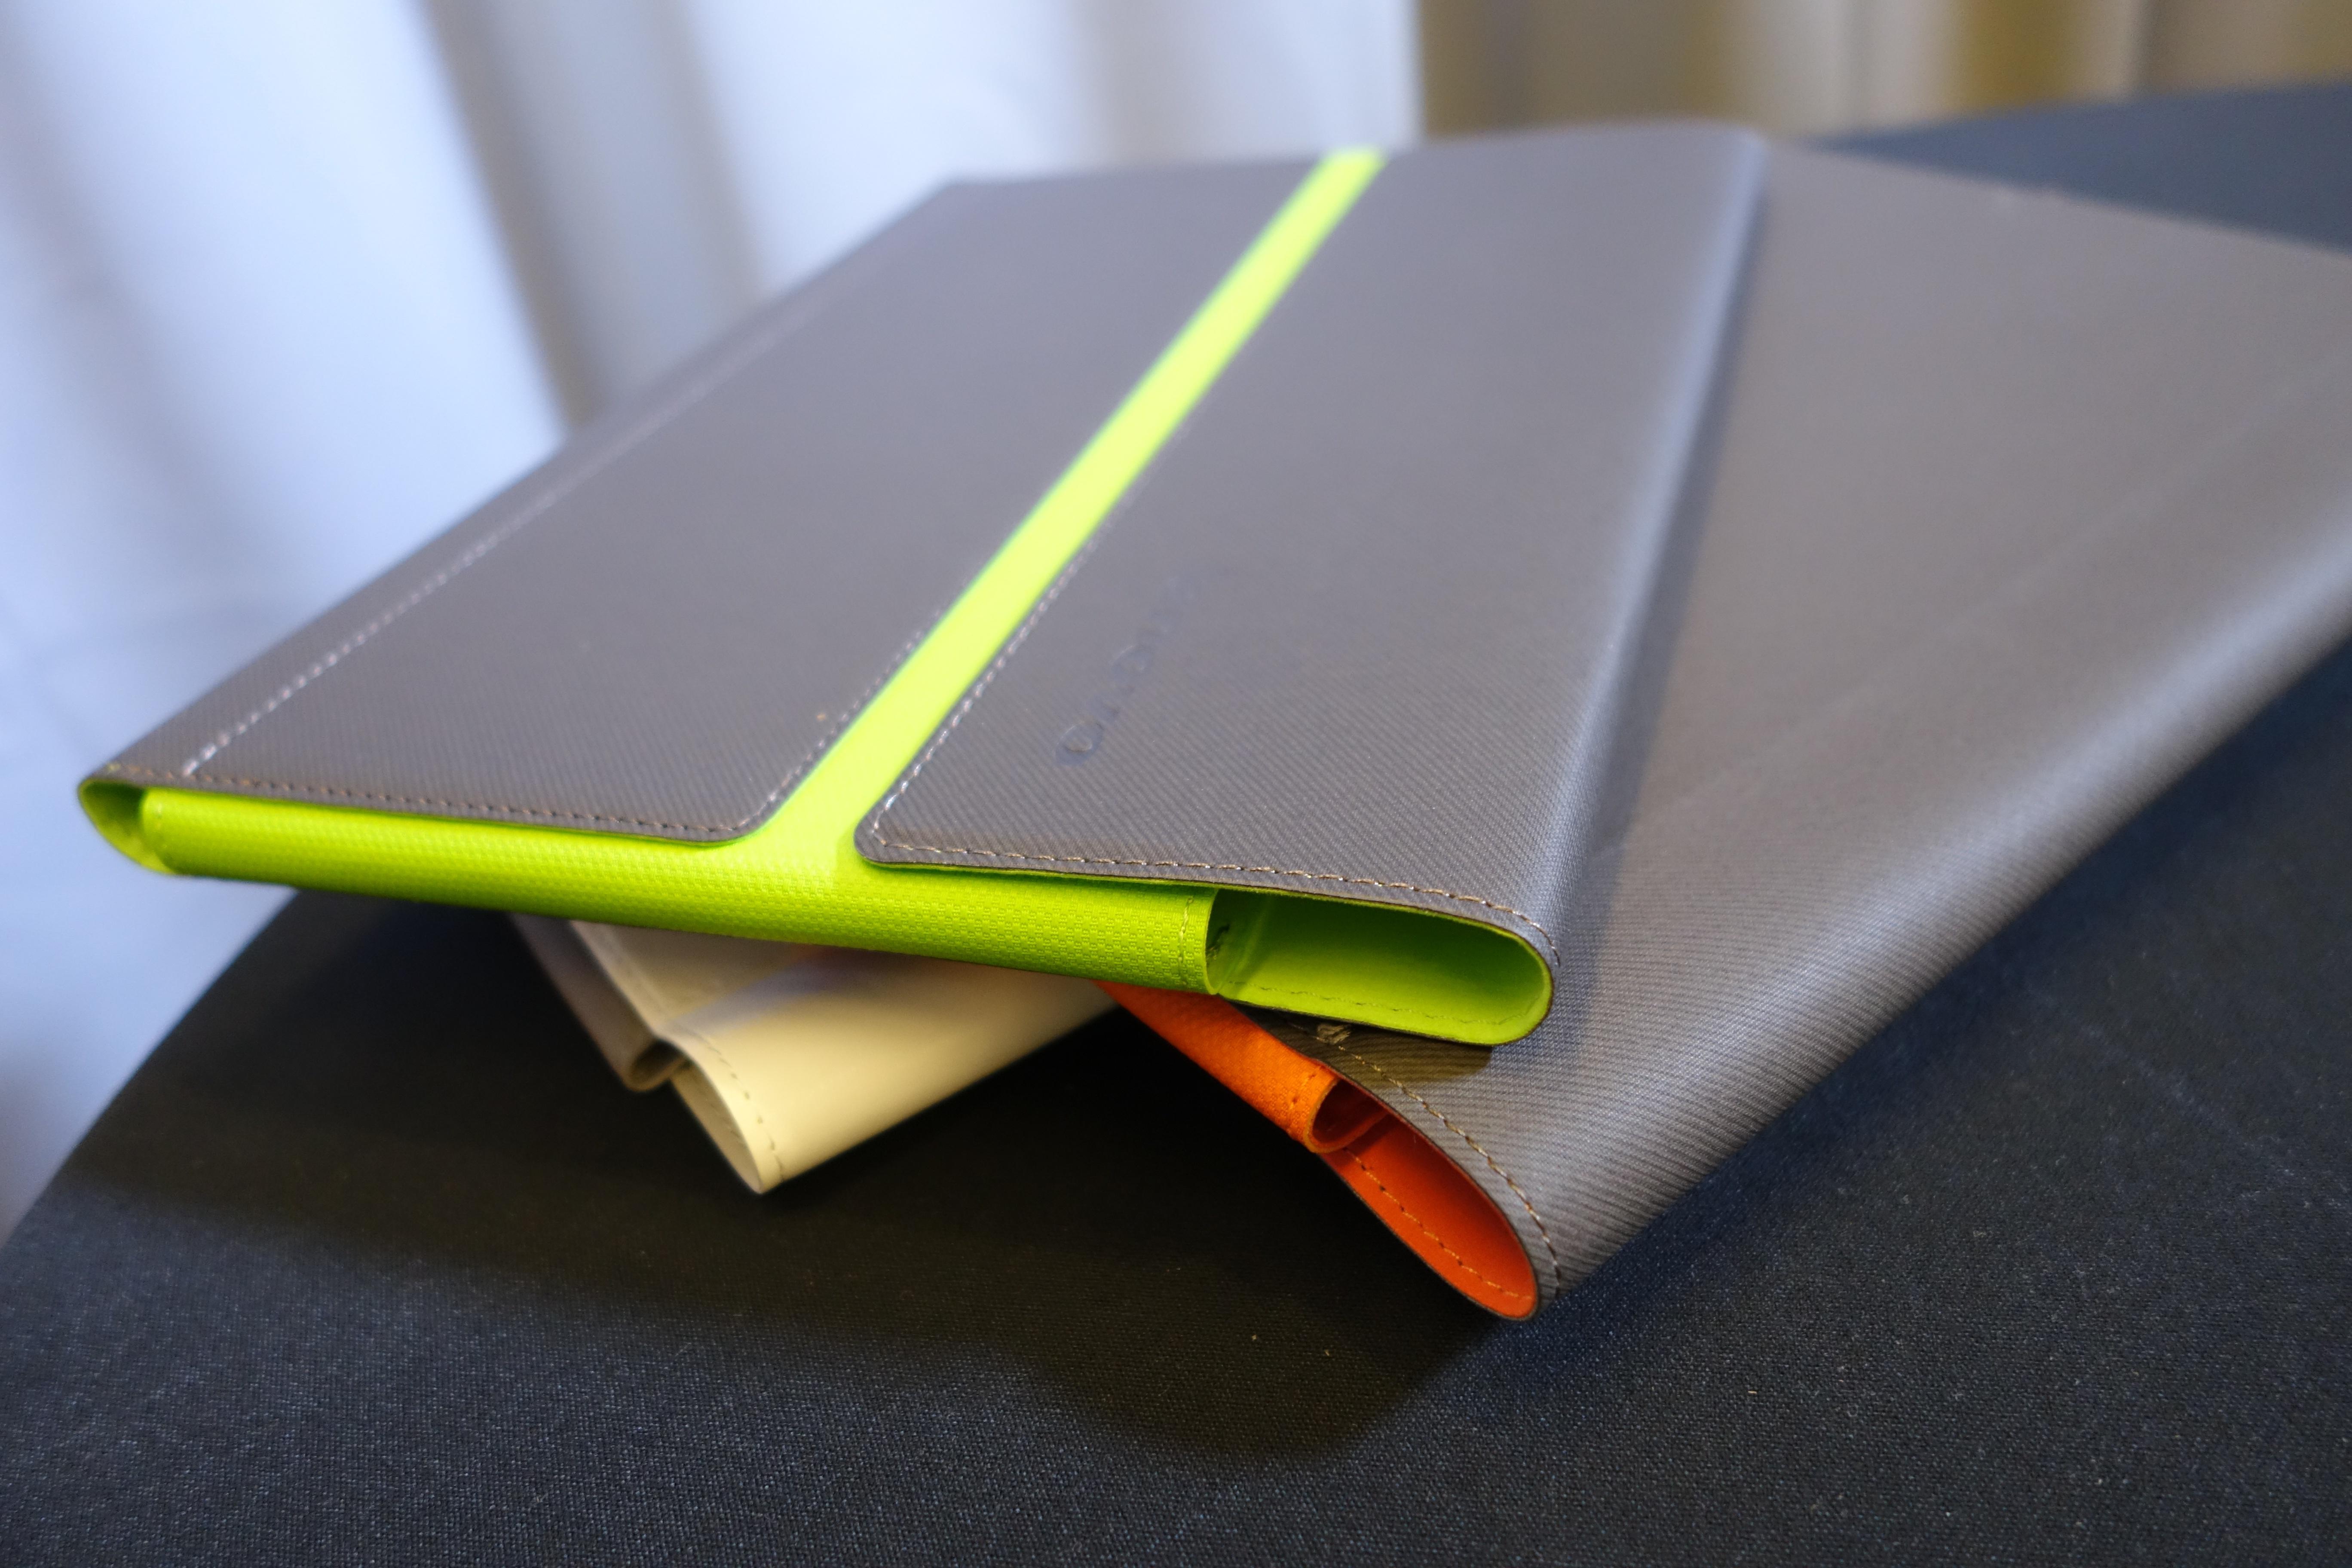 Lenovo Yoga Tablet 8 And 10 Introduced Video Tab